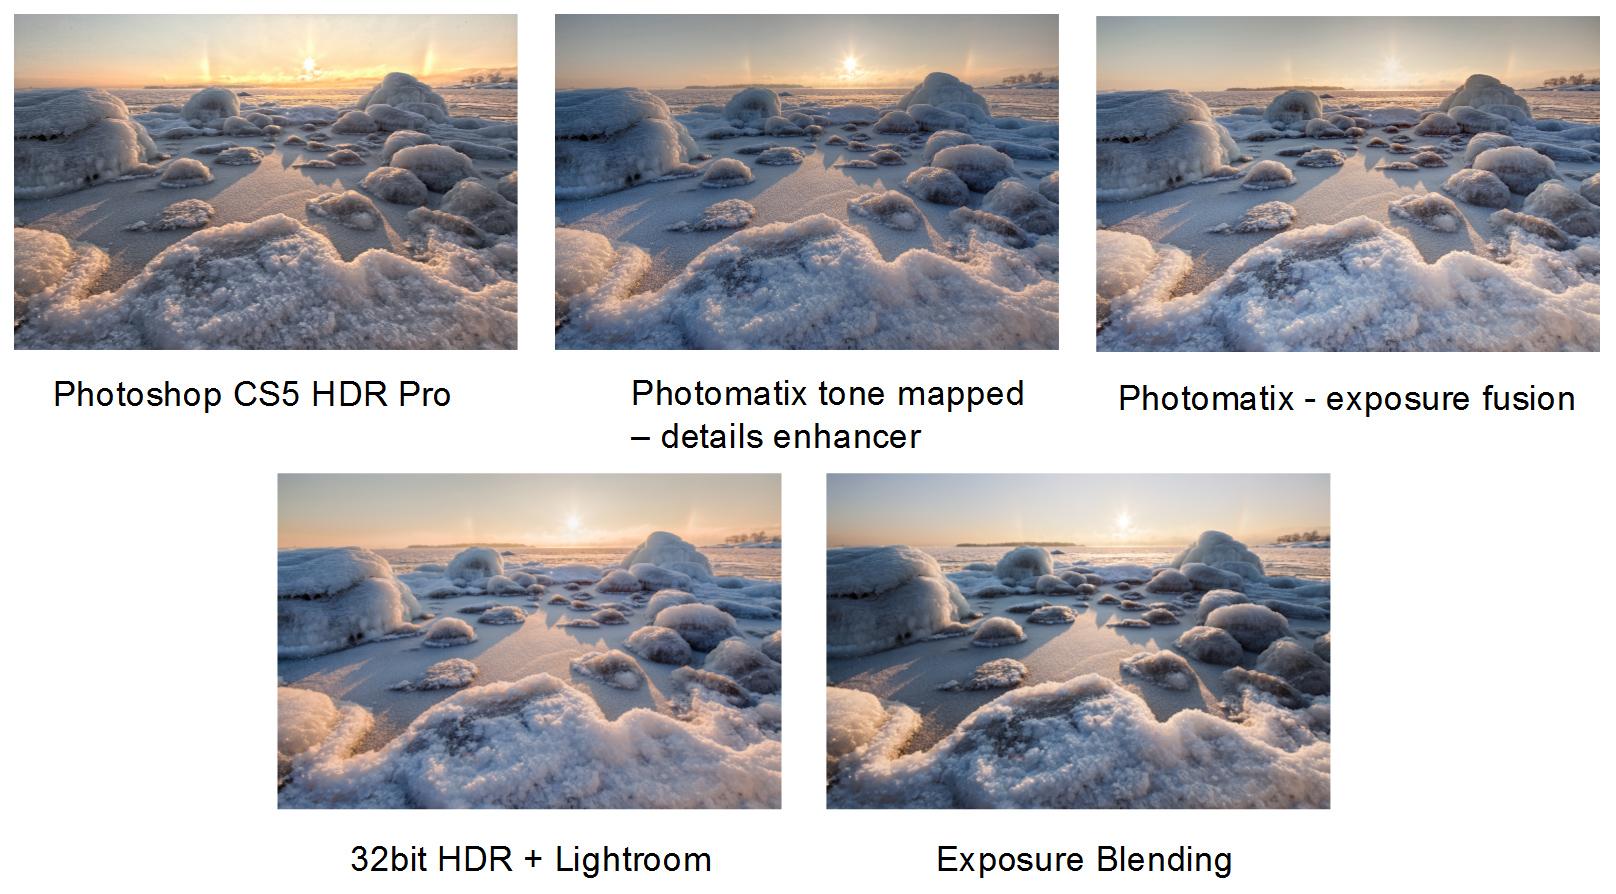 Eri HDR, exposure blending ja exposure fusion -menetelmien vertailua II